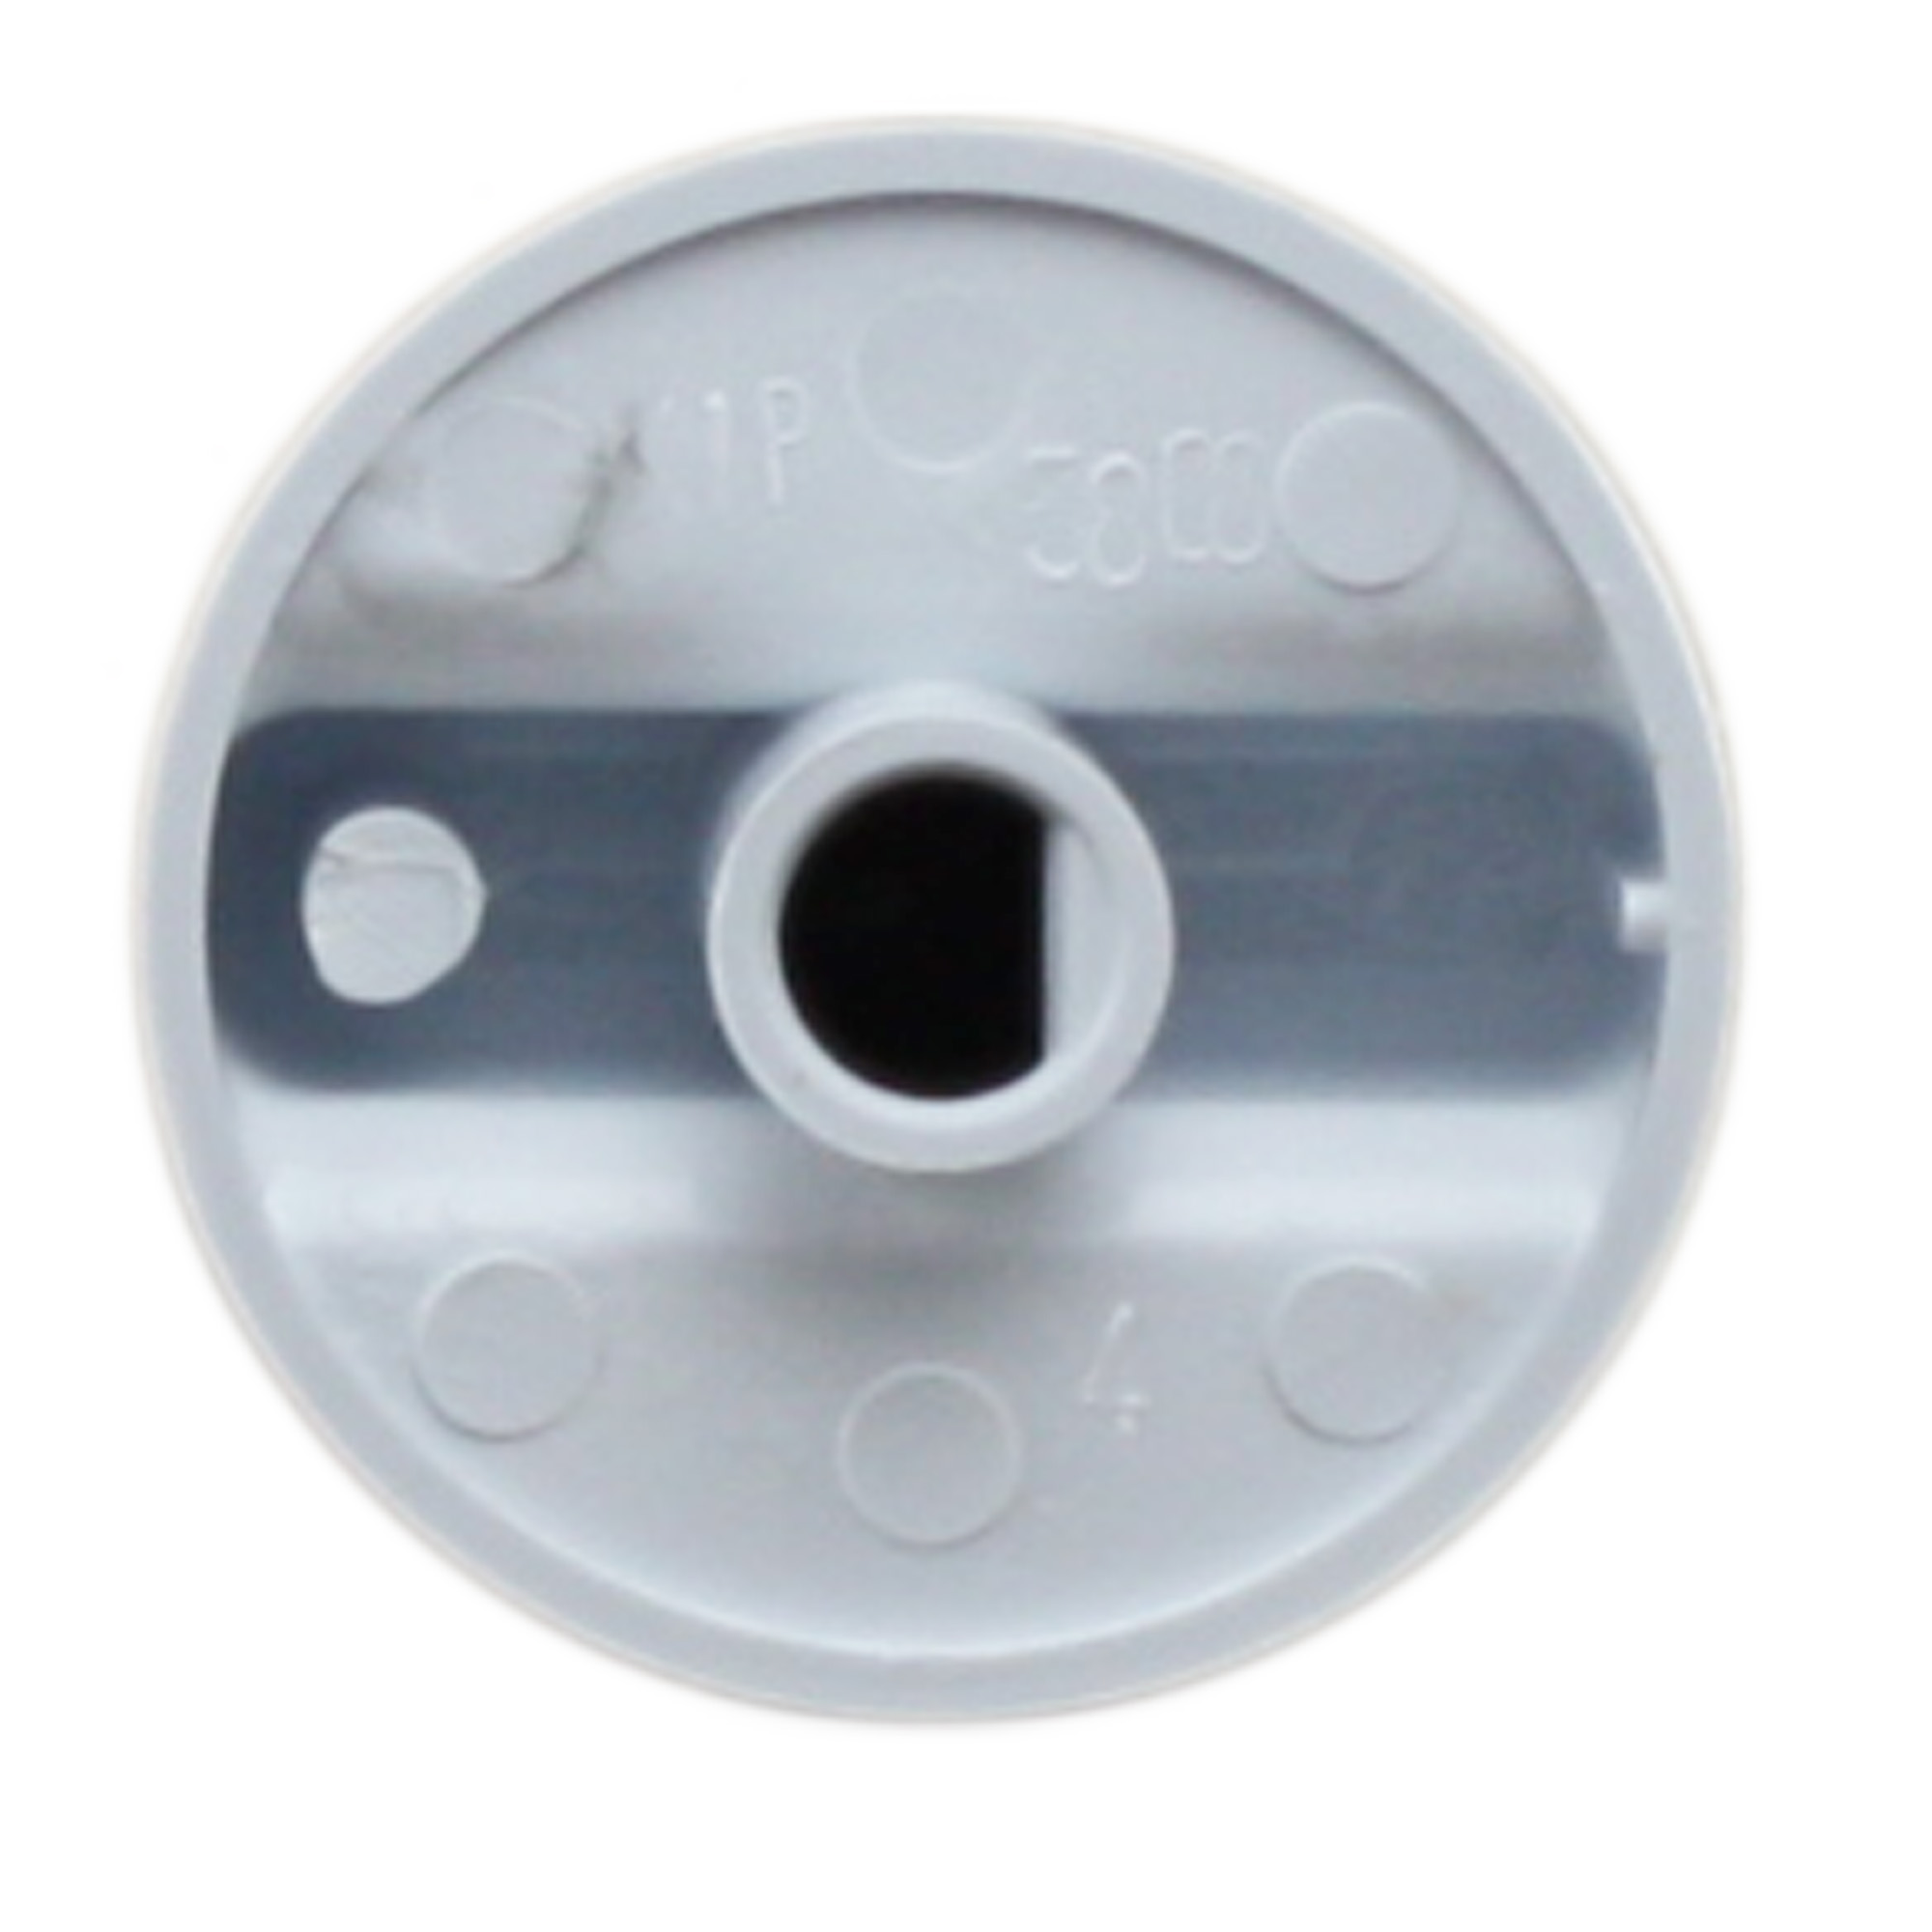 Genuine 131858004 Frigidaire Dryer Knob